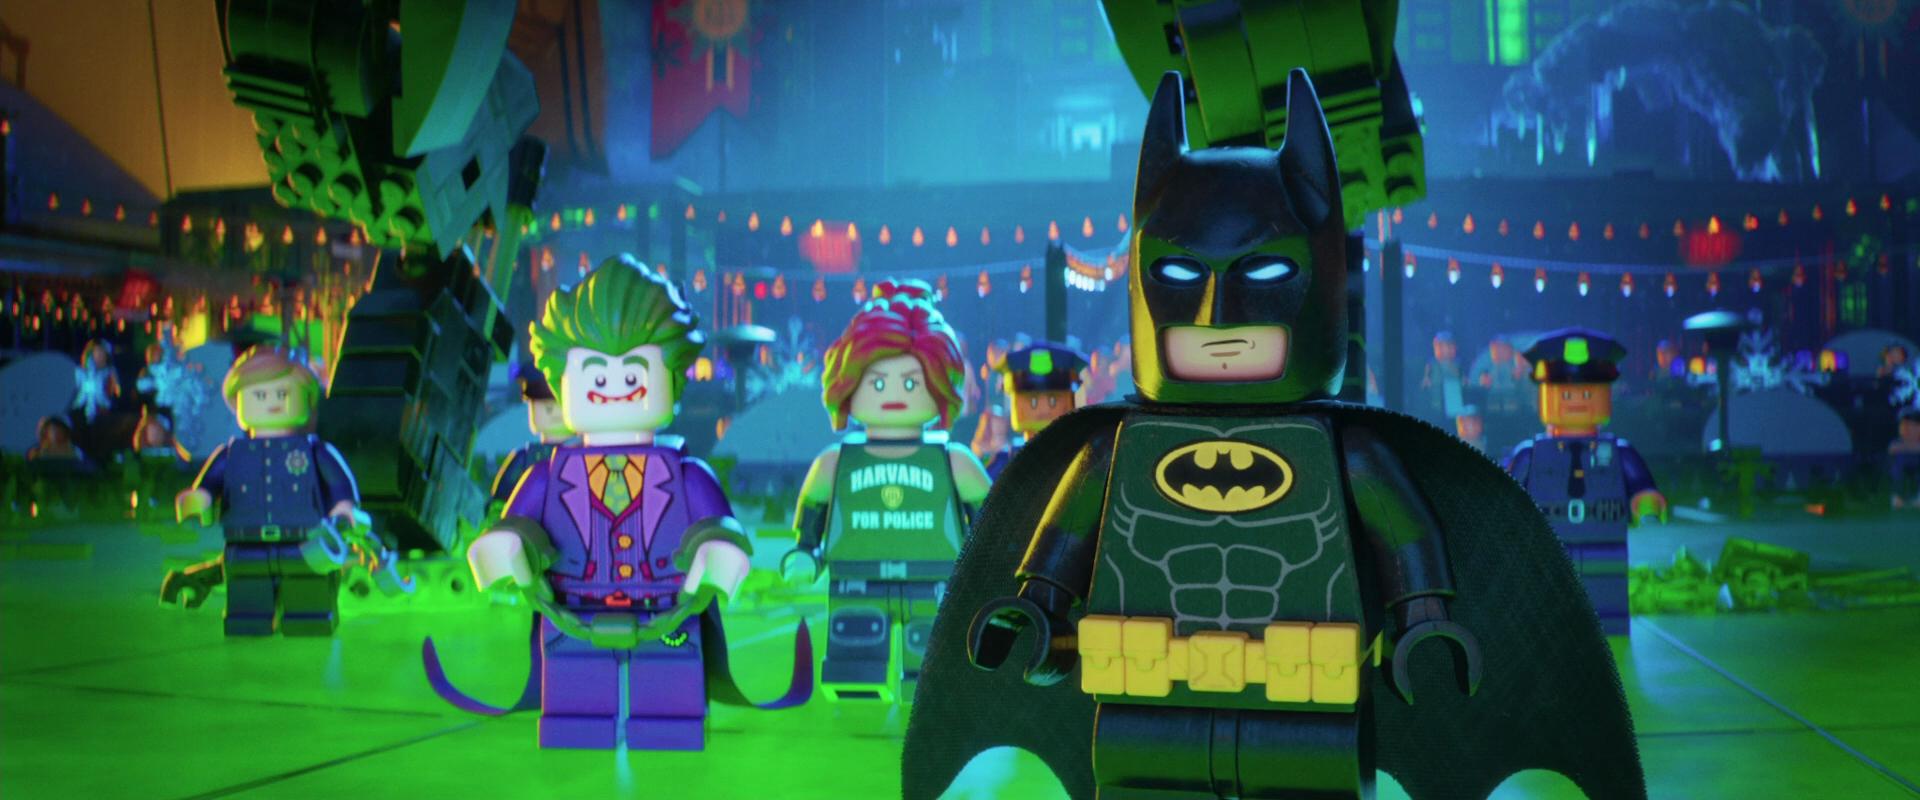 Lego Batman Movie French Torrent